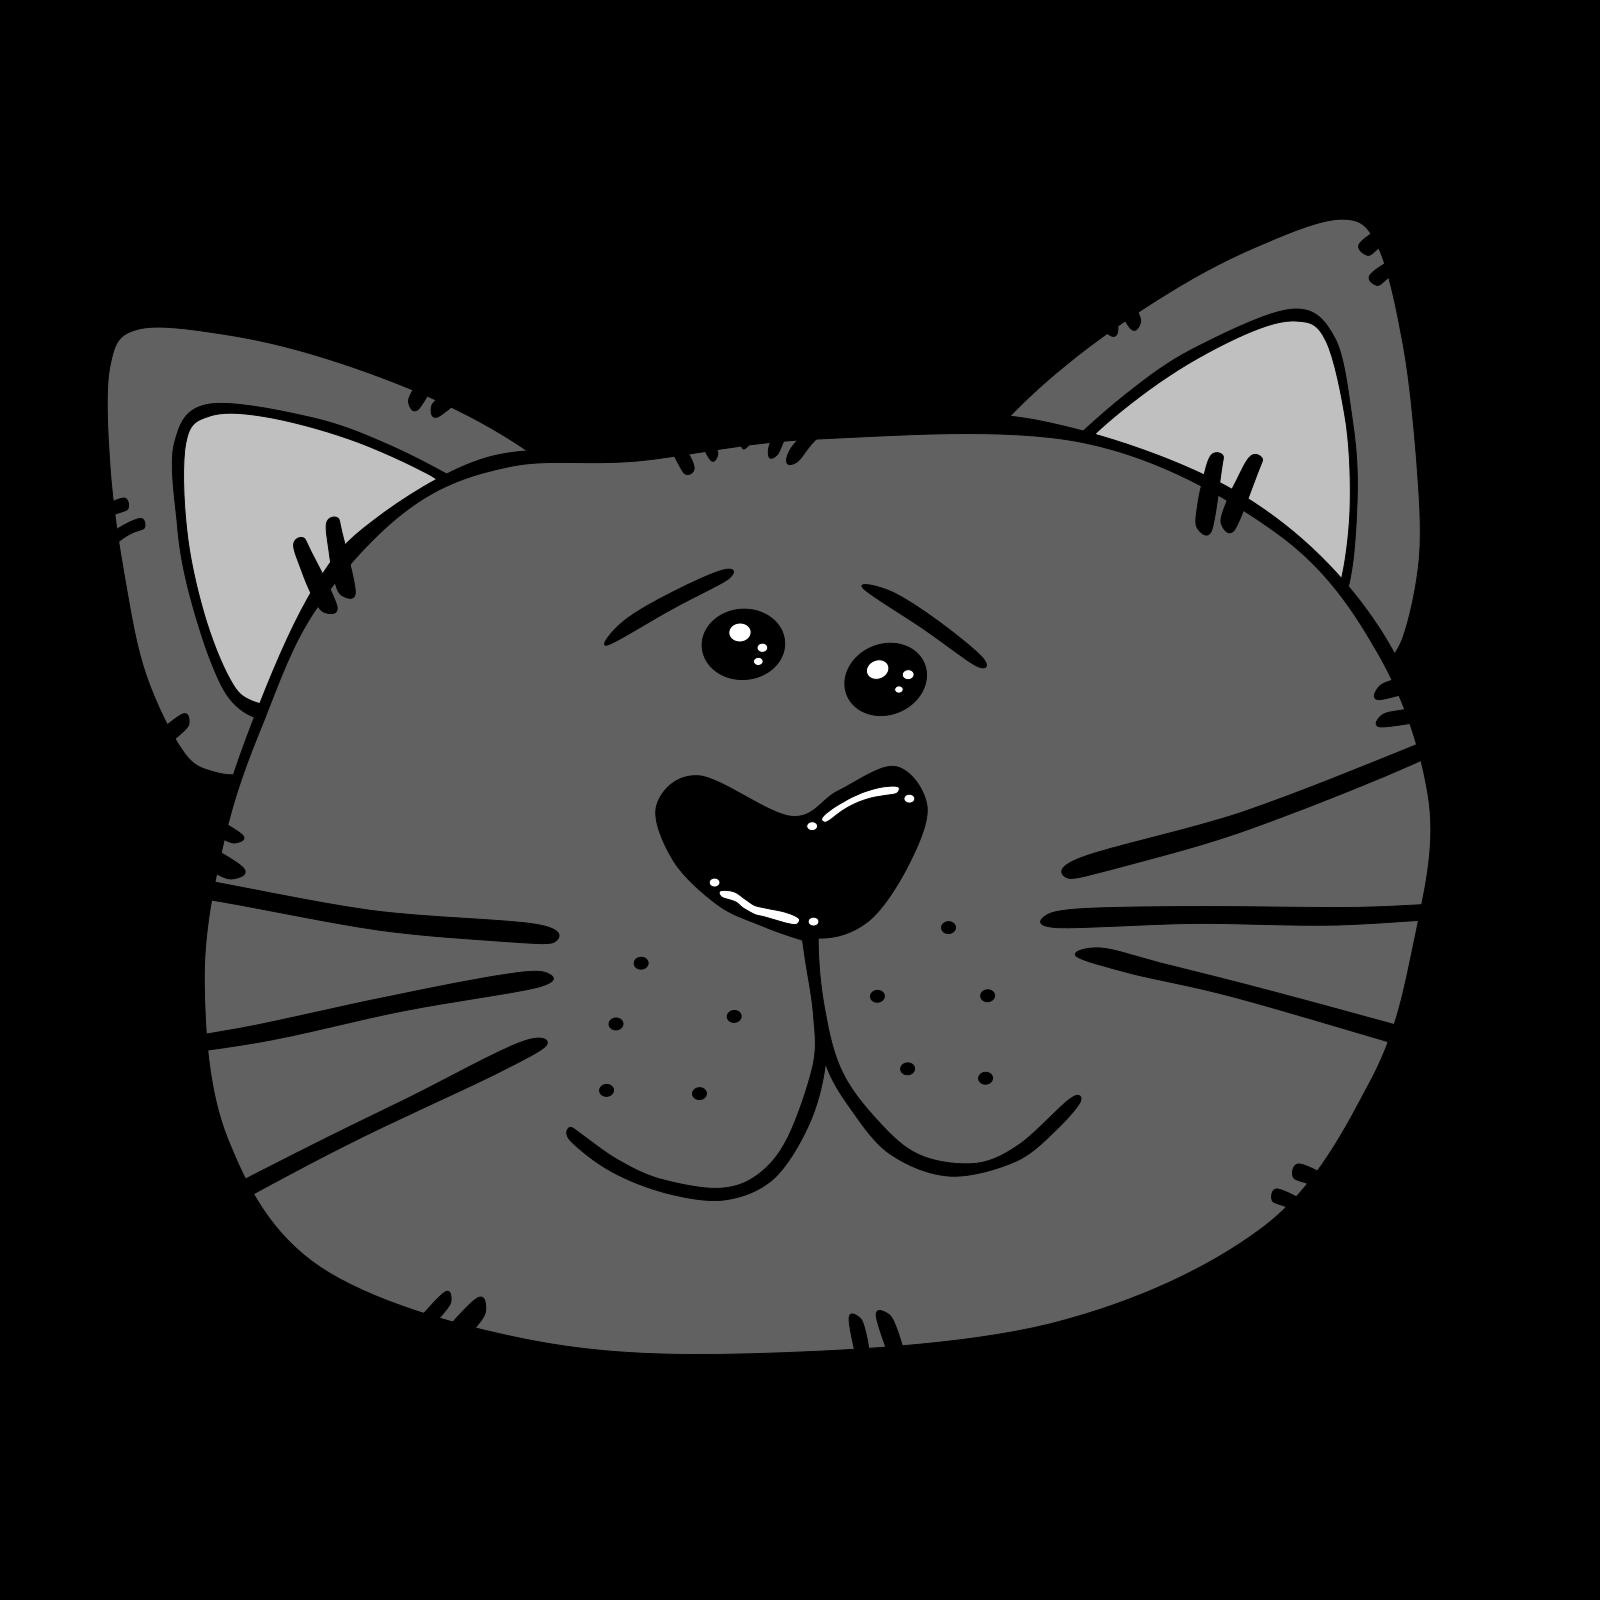 Black Cartoon Cat Face Svg Vector Black Cartoon Cat Face Clip Art